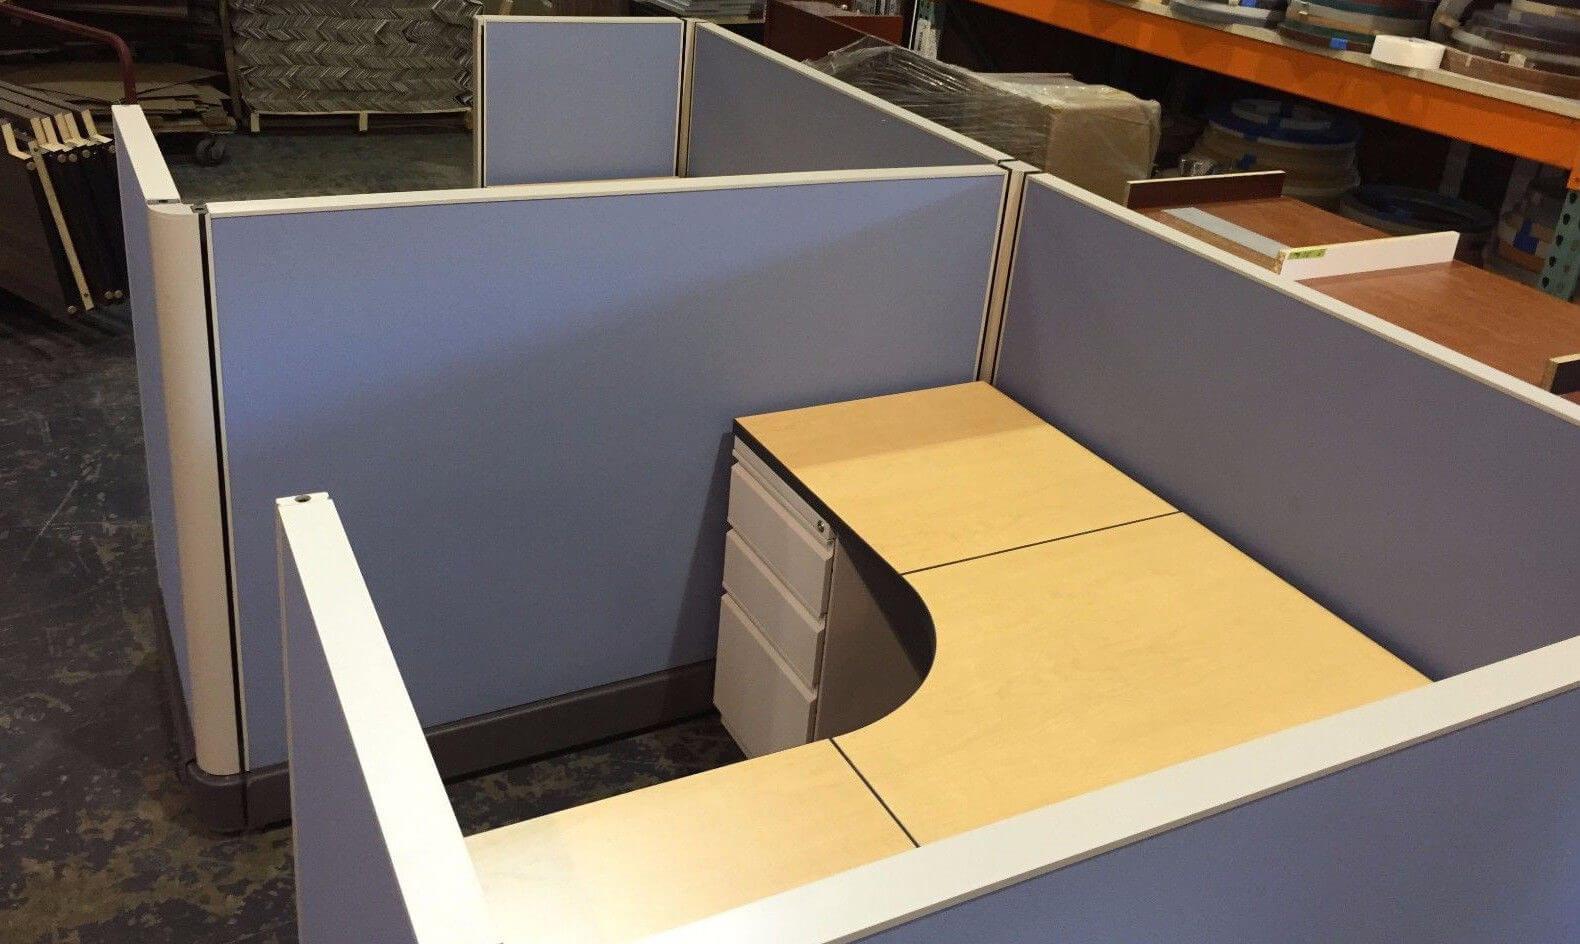 used herman miller ao2 5x5 - low panels